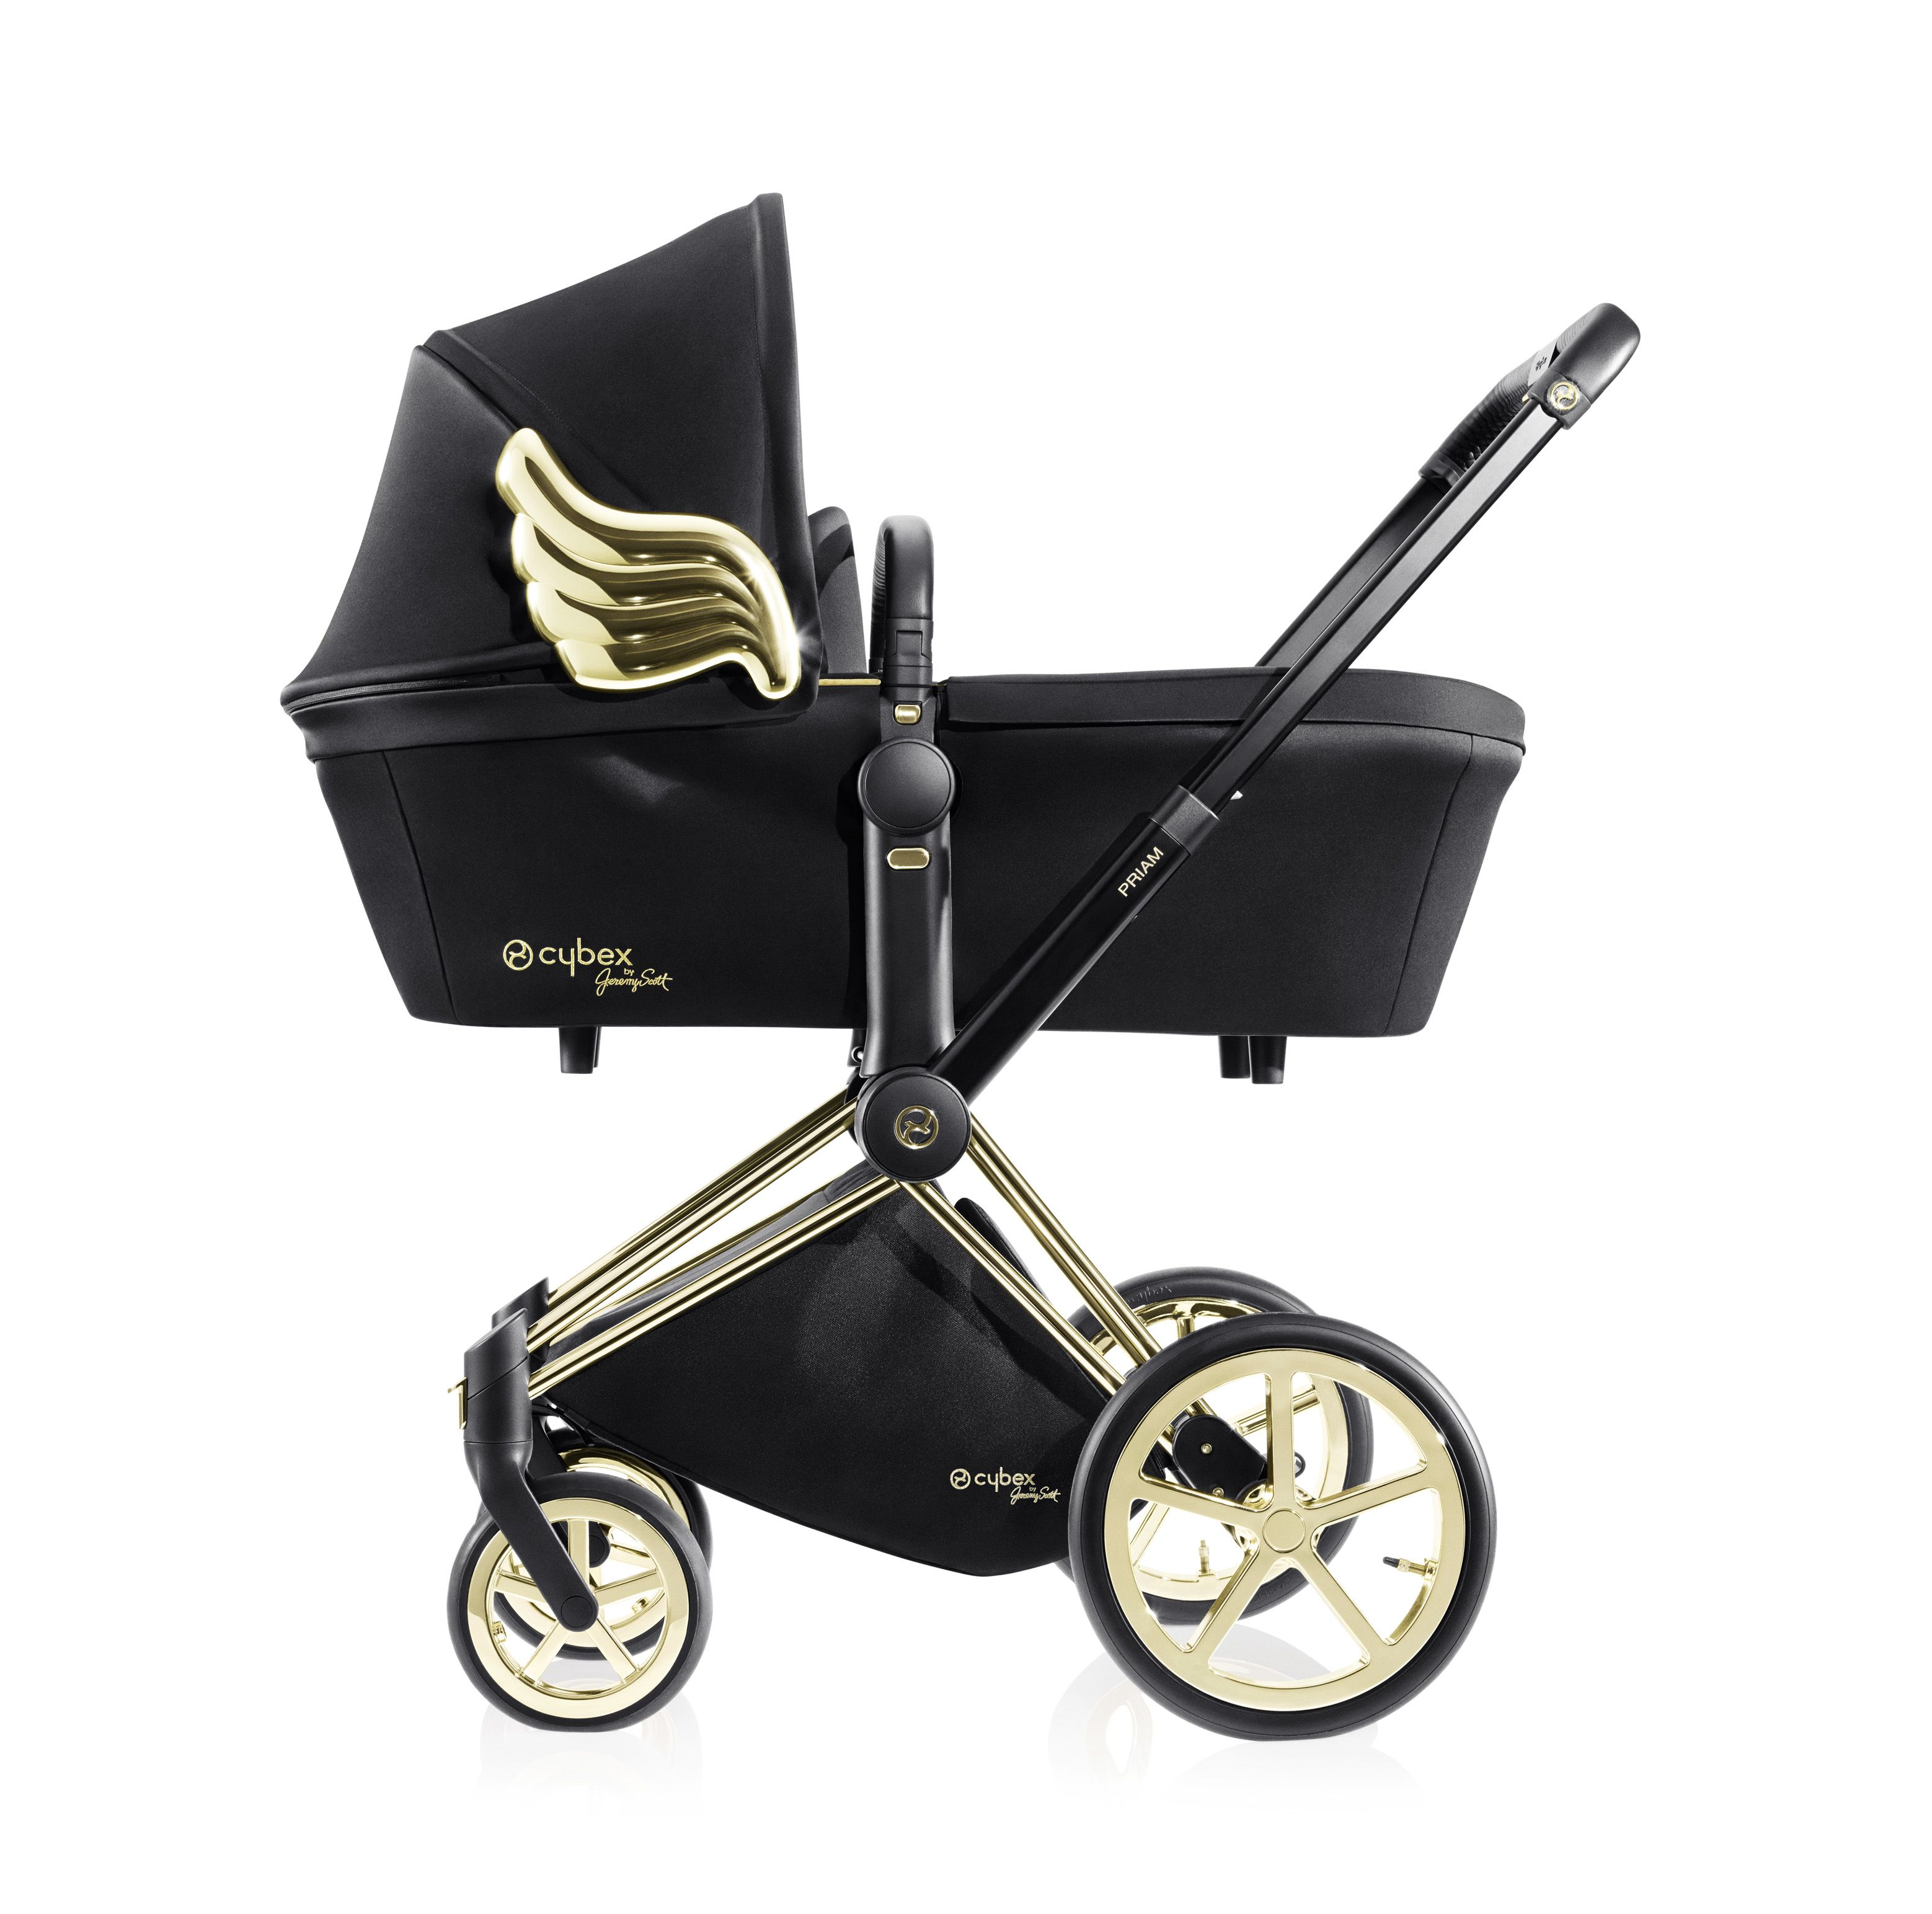 CYBEXbyJeremyScott PRIAM with Carry Cot Baby strollers